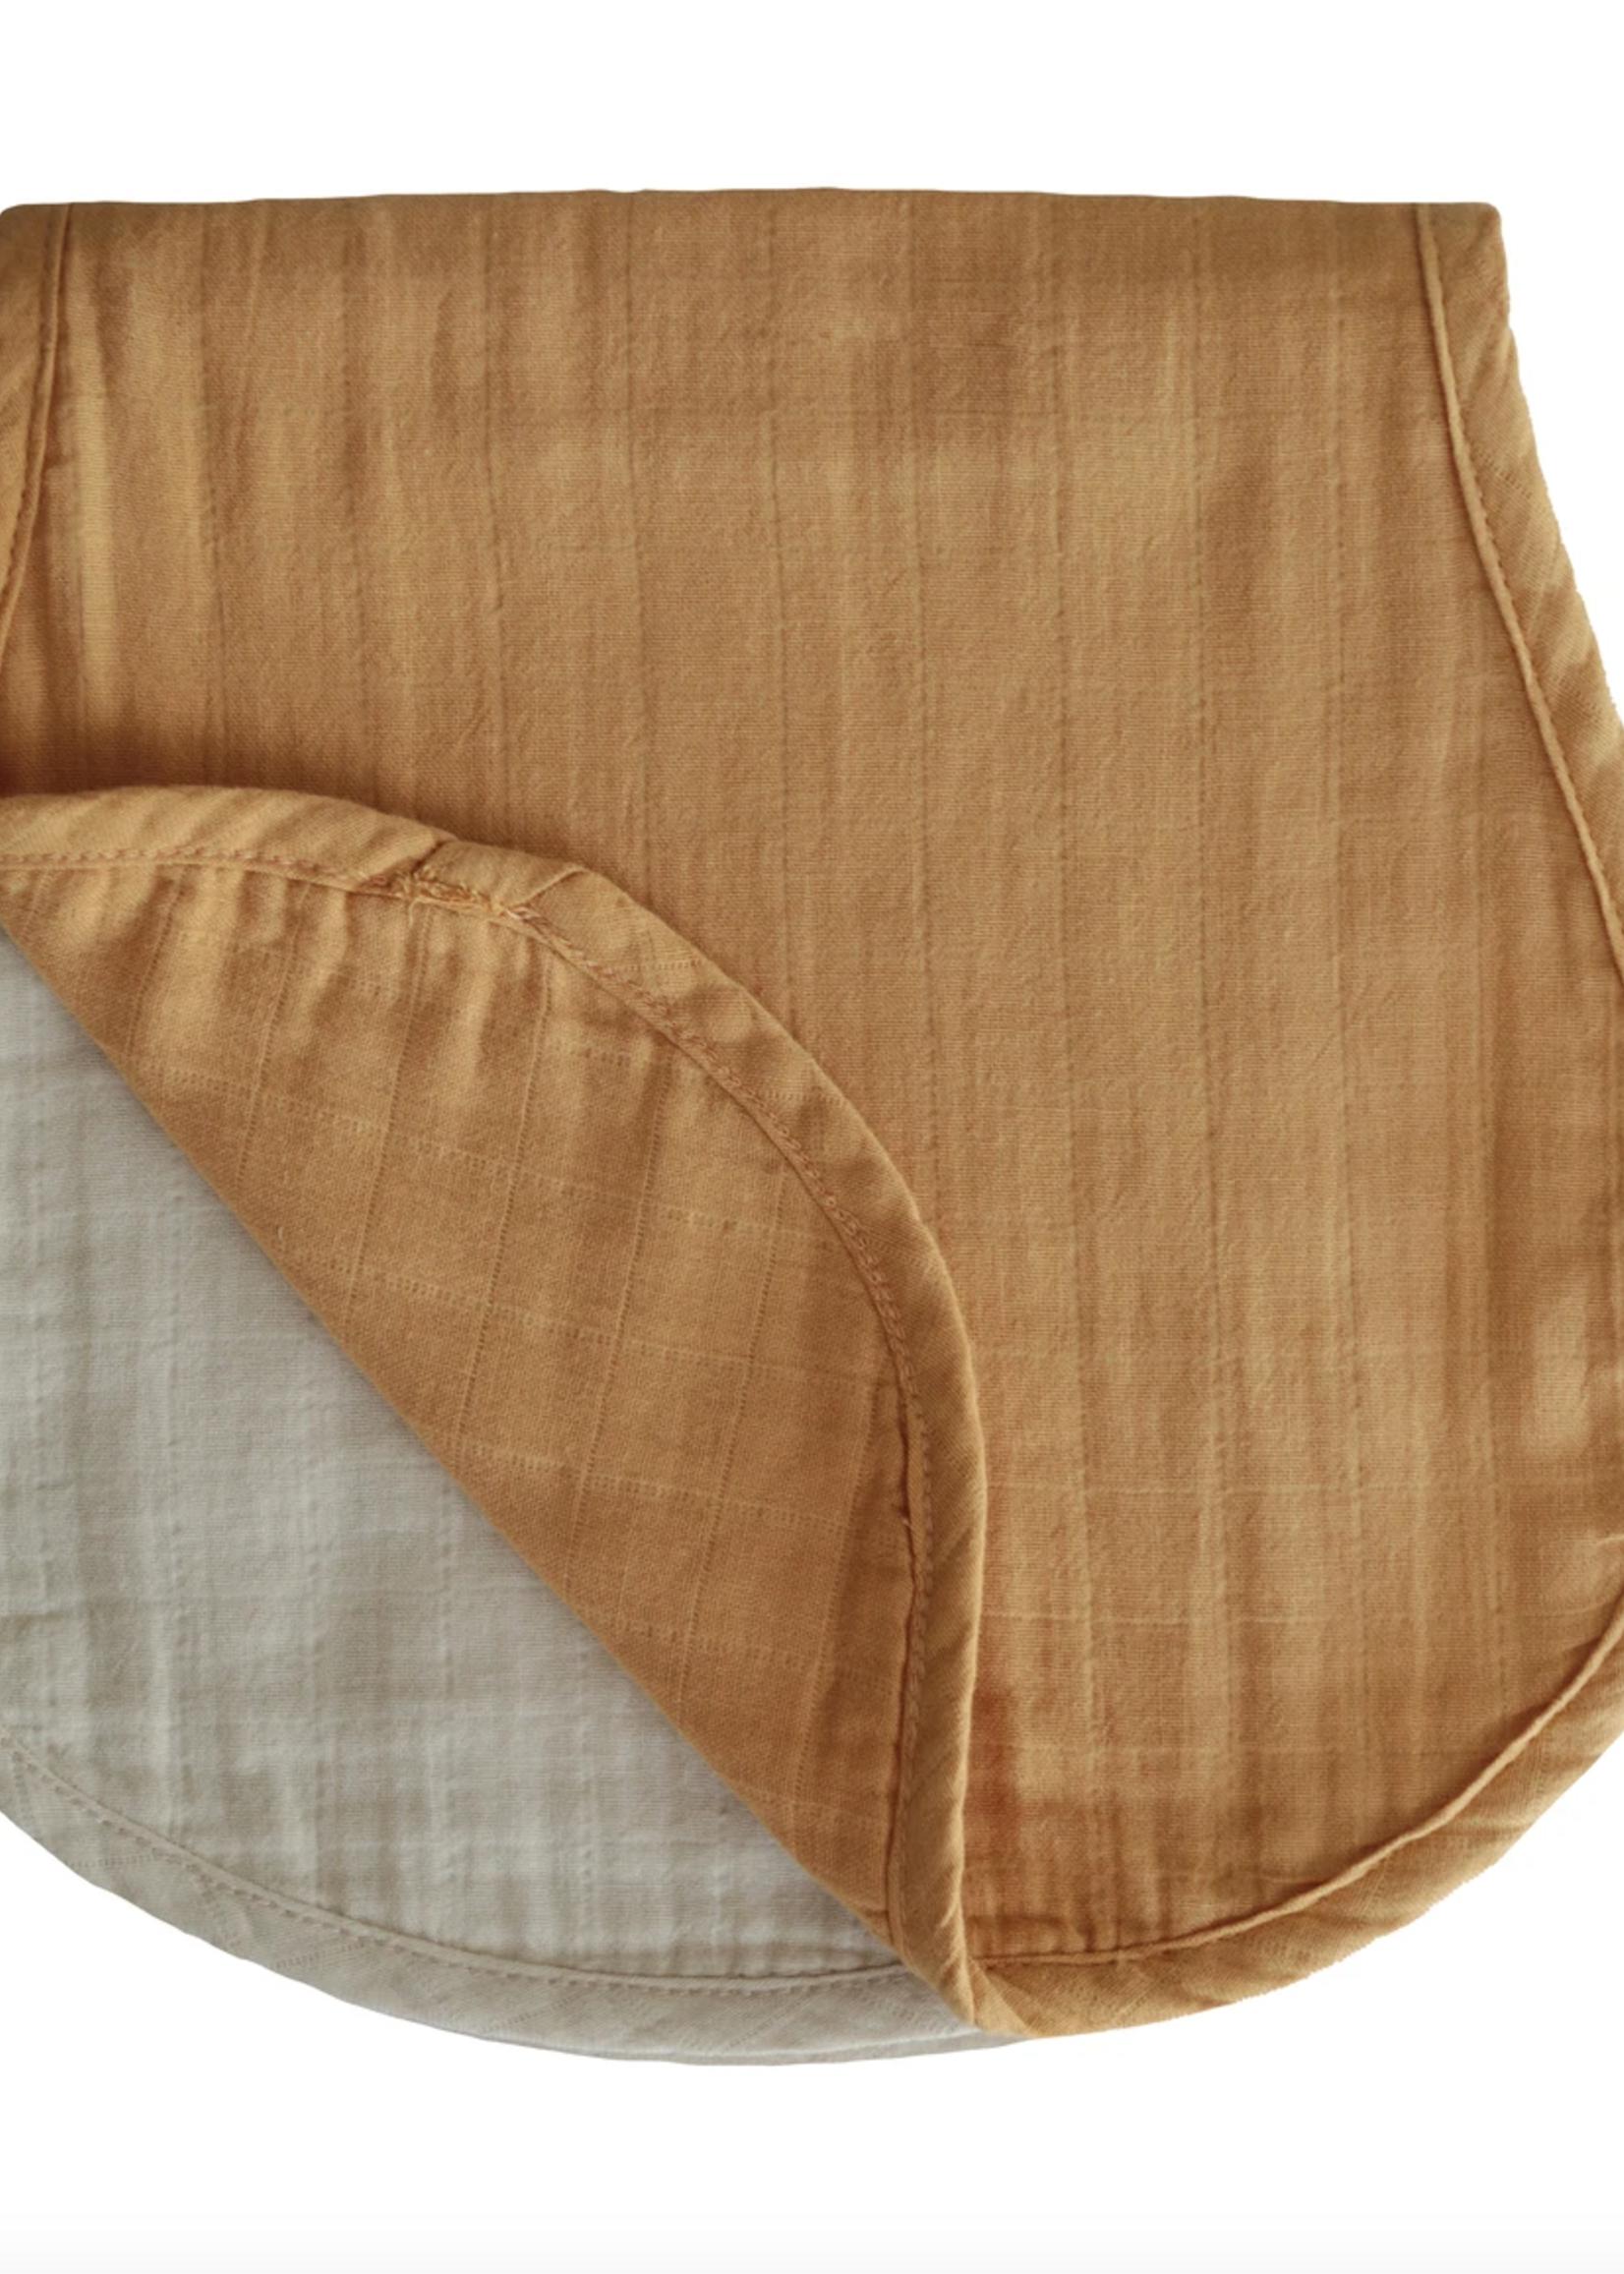 Elitaire Petite Muslin 2-Pack Burp Cloth in Yellow/Fog